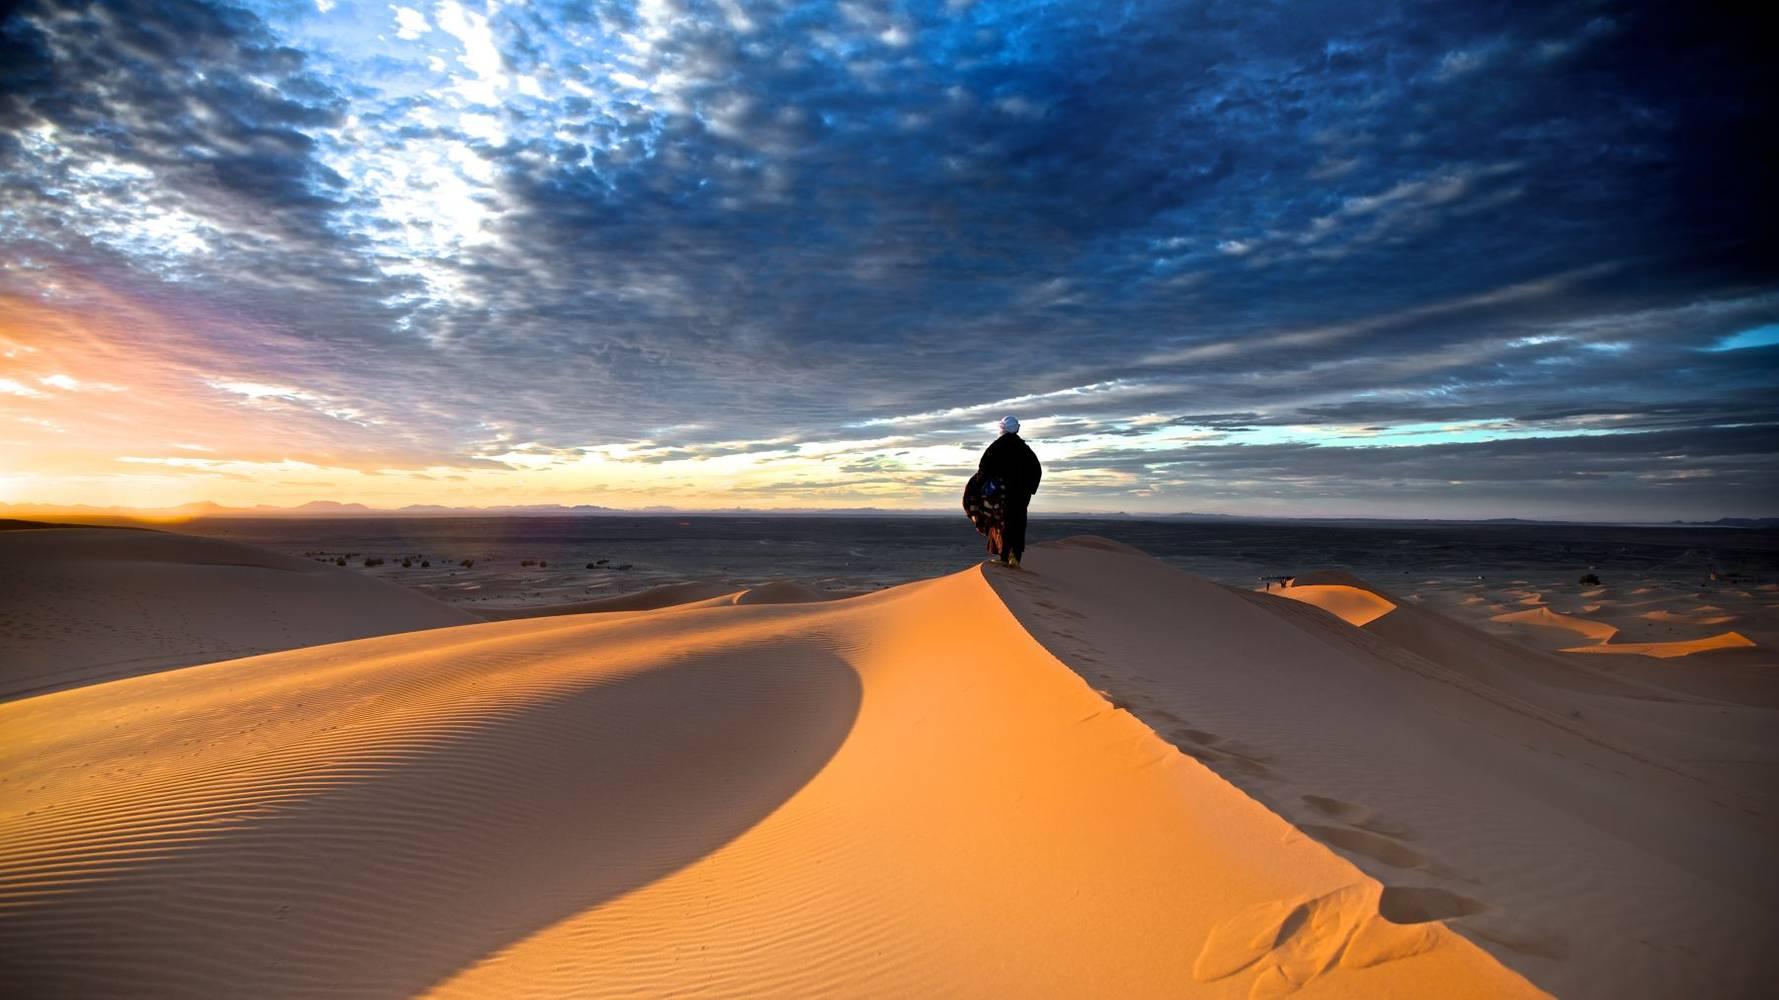 1_0_191_1sahara_desert_morocco_rodanuri_com__4_.jpg